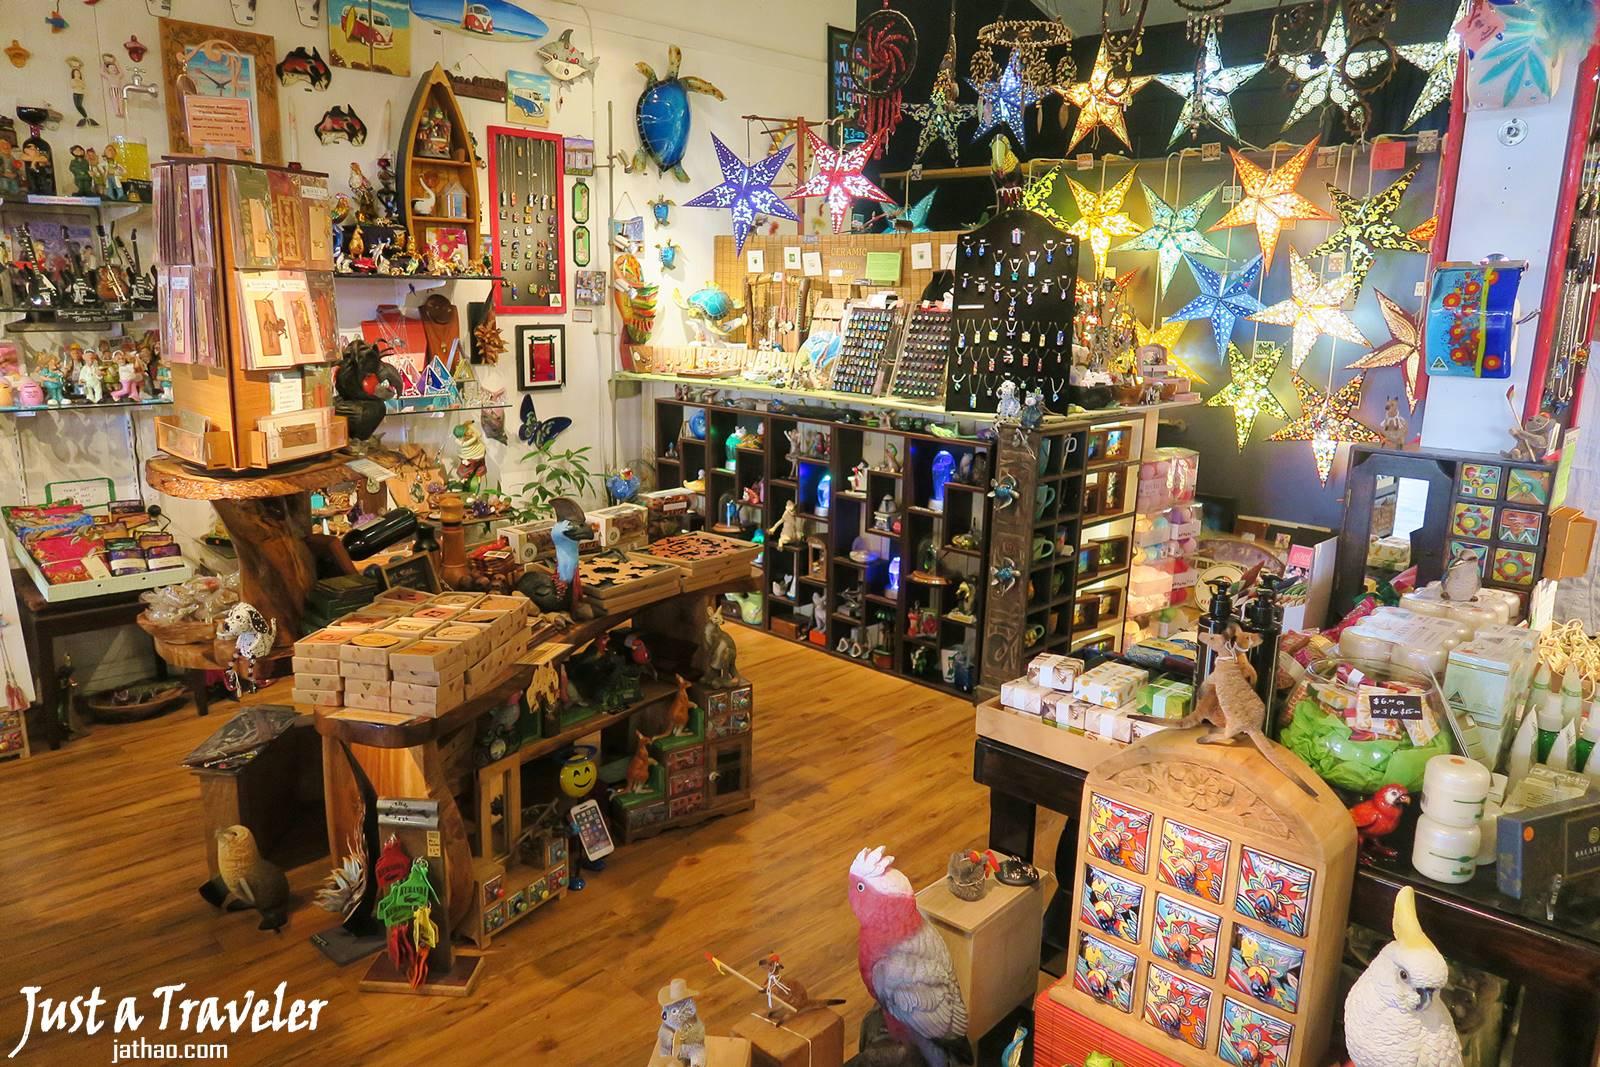 凱恩斯-庫蘭達-景點-市集-自由行-旅遊-澳洲-Cairns-Market-Travel-Tourist-Attraction-Australia